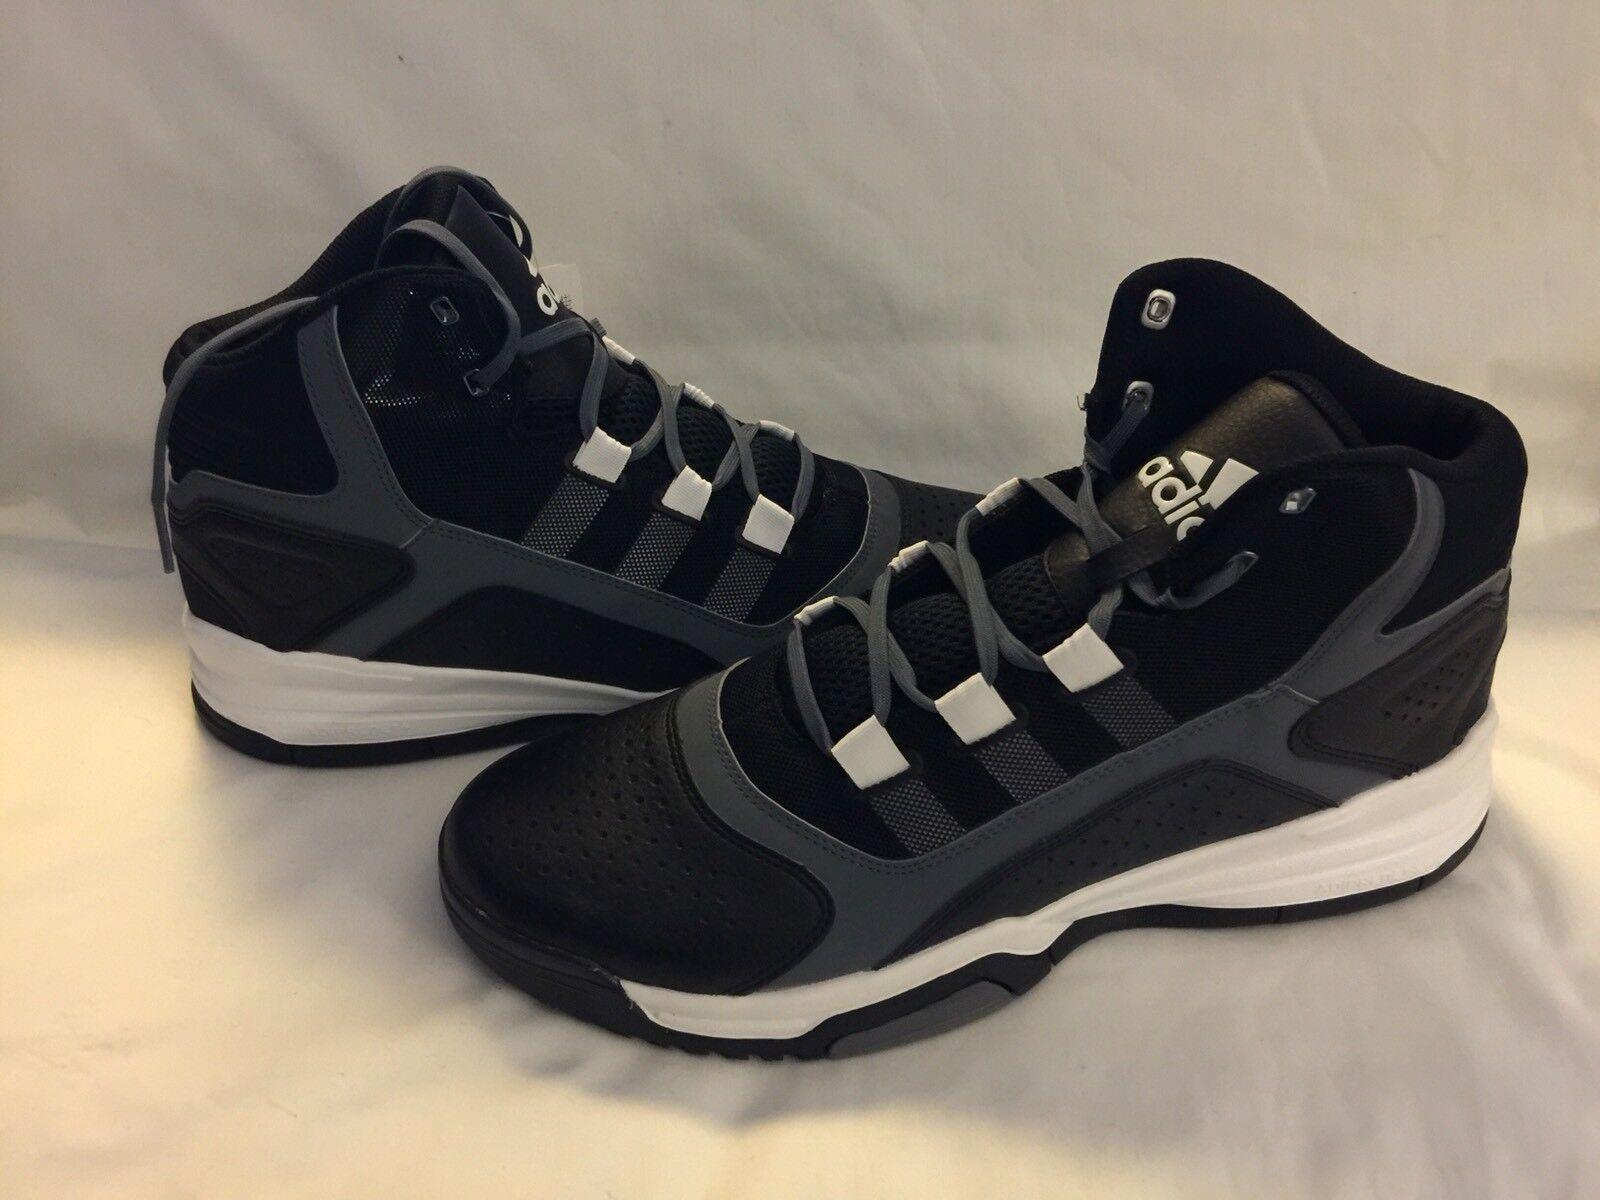 Brand New Adidas Amplify Basketball shoes Black Size 13